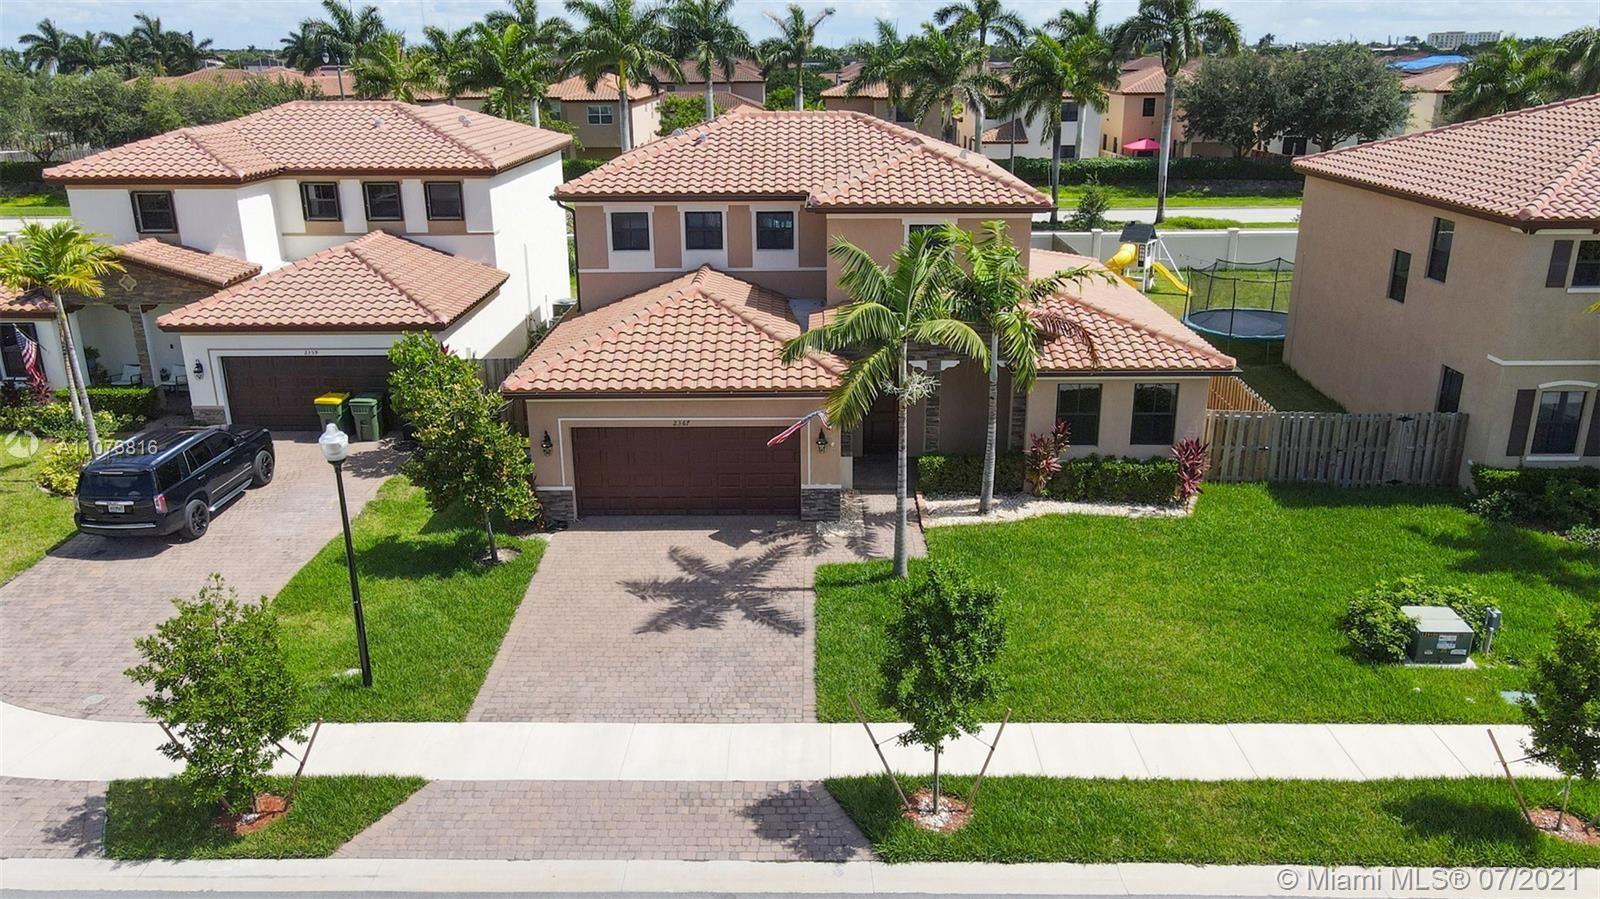 2367 SE 1st St, Homestead, FL 33033 - #: A11073816